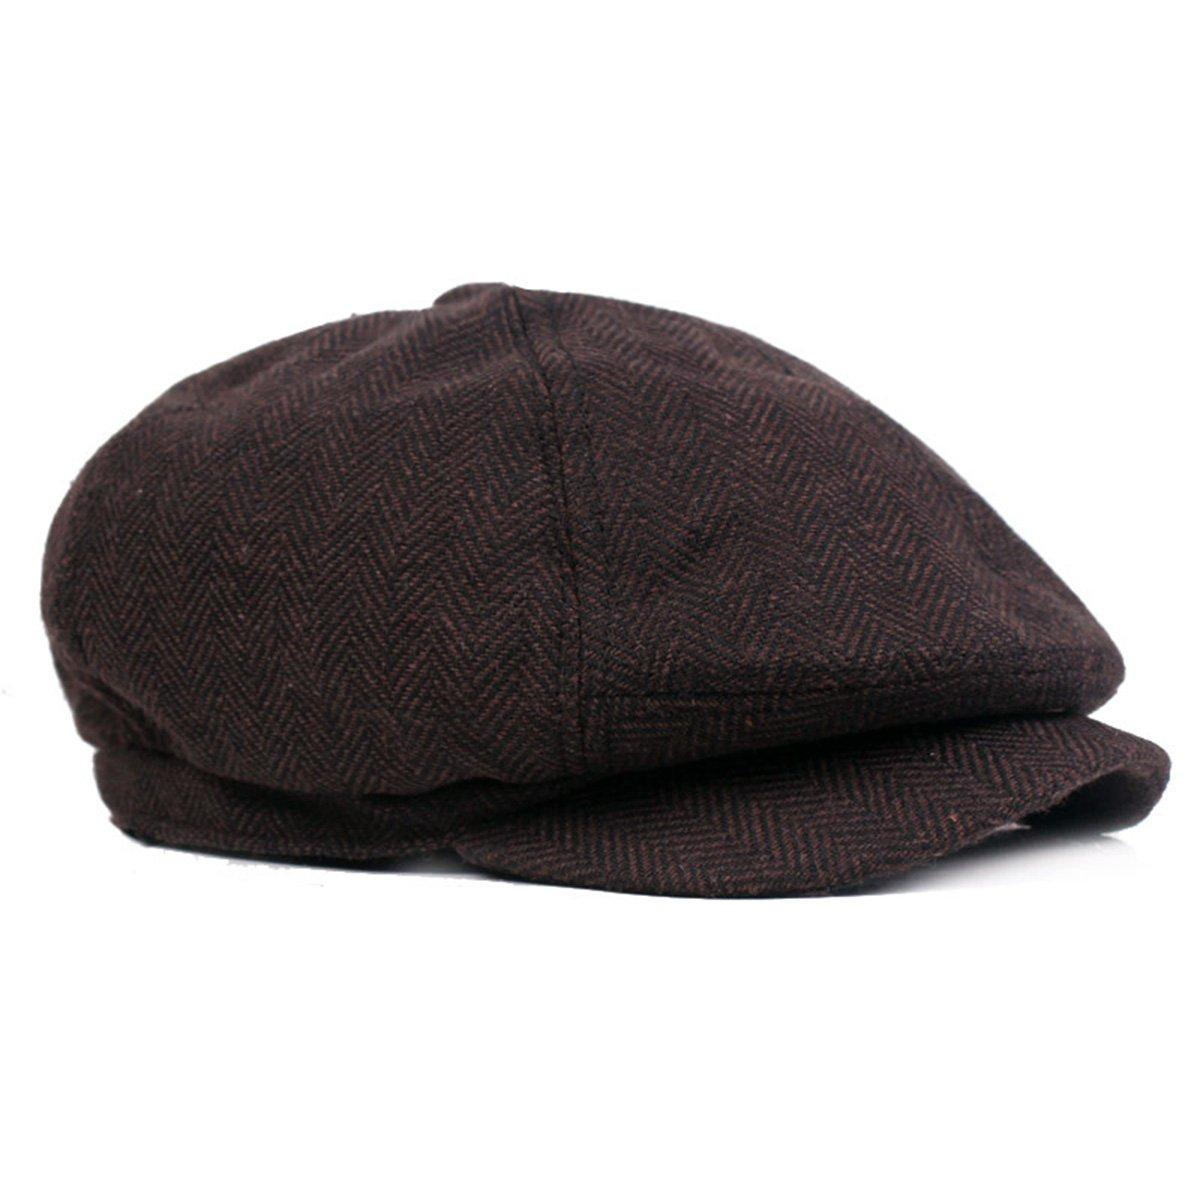 ZLSLZ Mens Striped 8 Panel Ivy Newsboy Cabbie Gatsby Beret Painter Hats Caps For Men